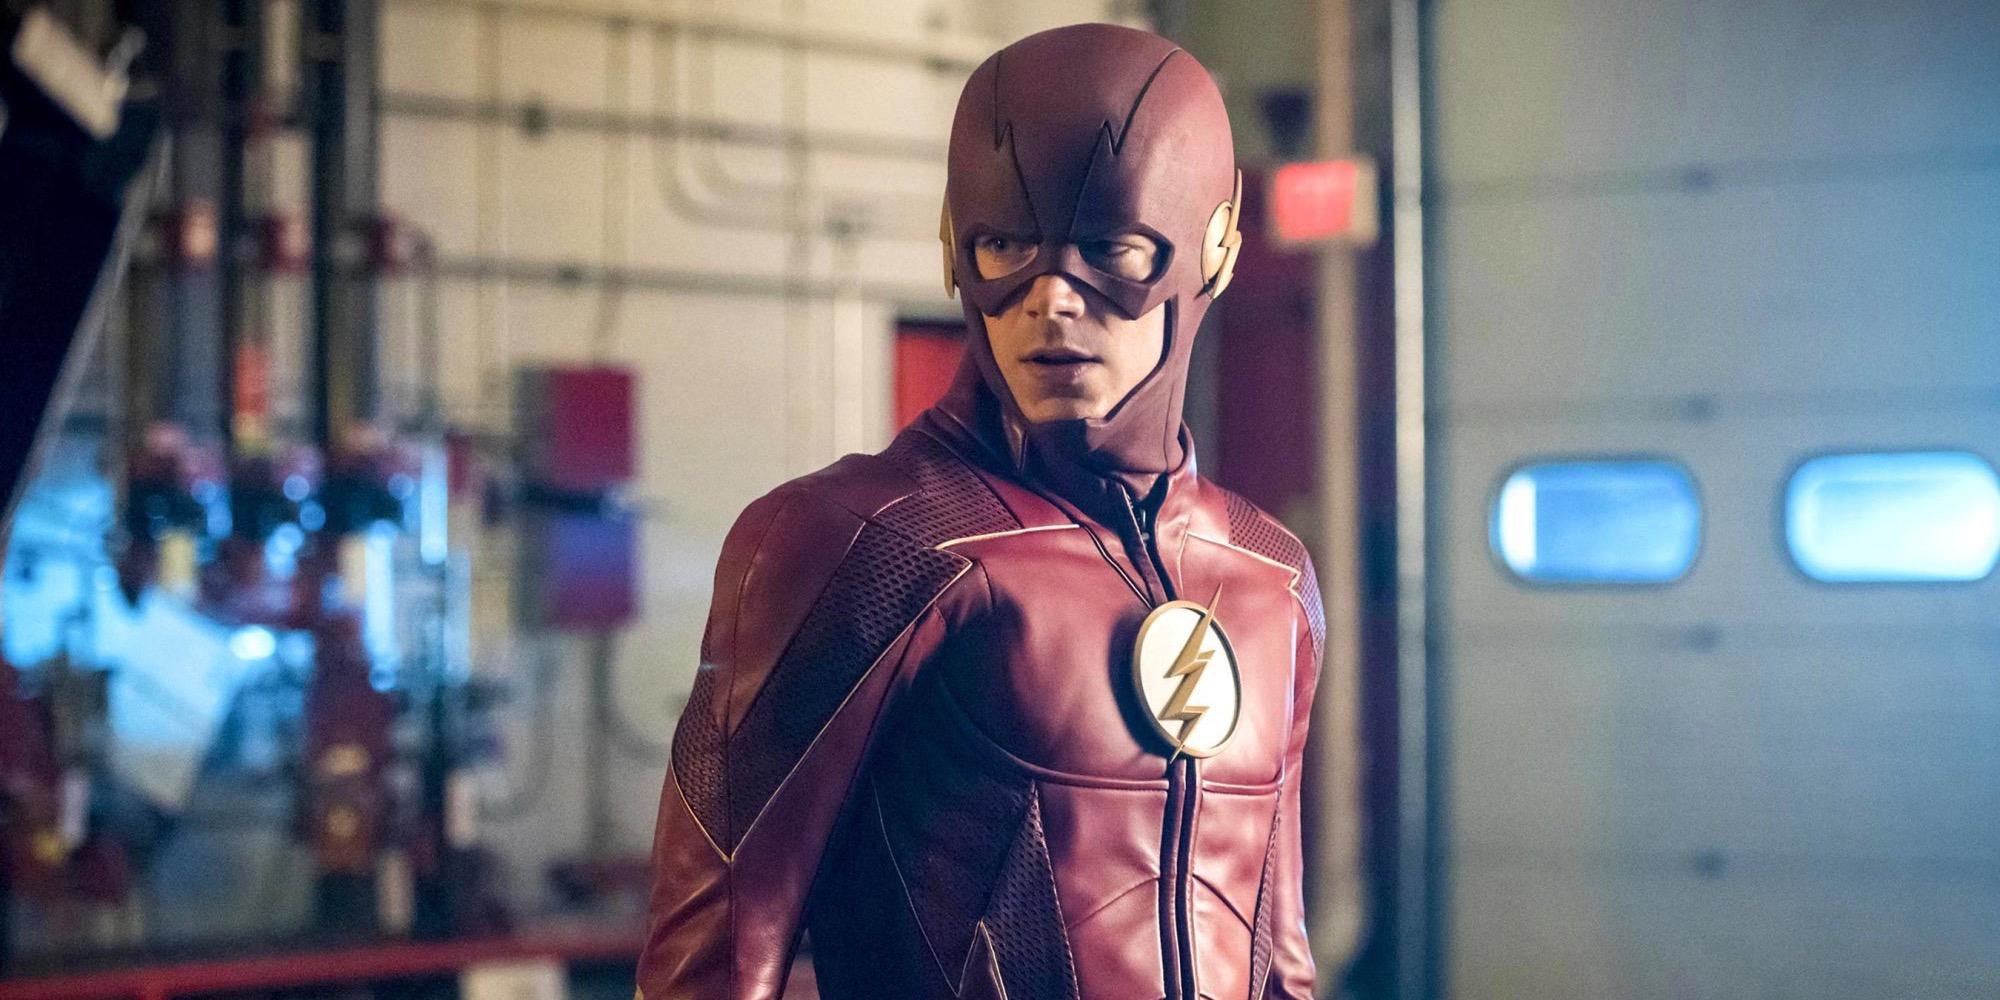 The Flash Mixed Signals Promo